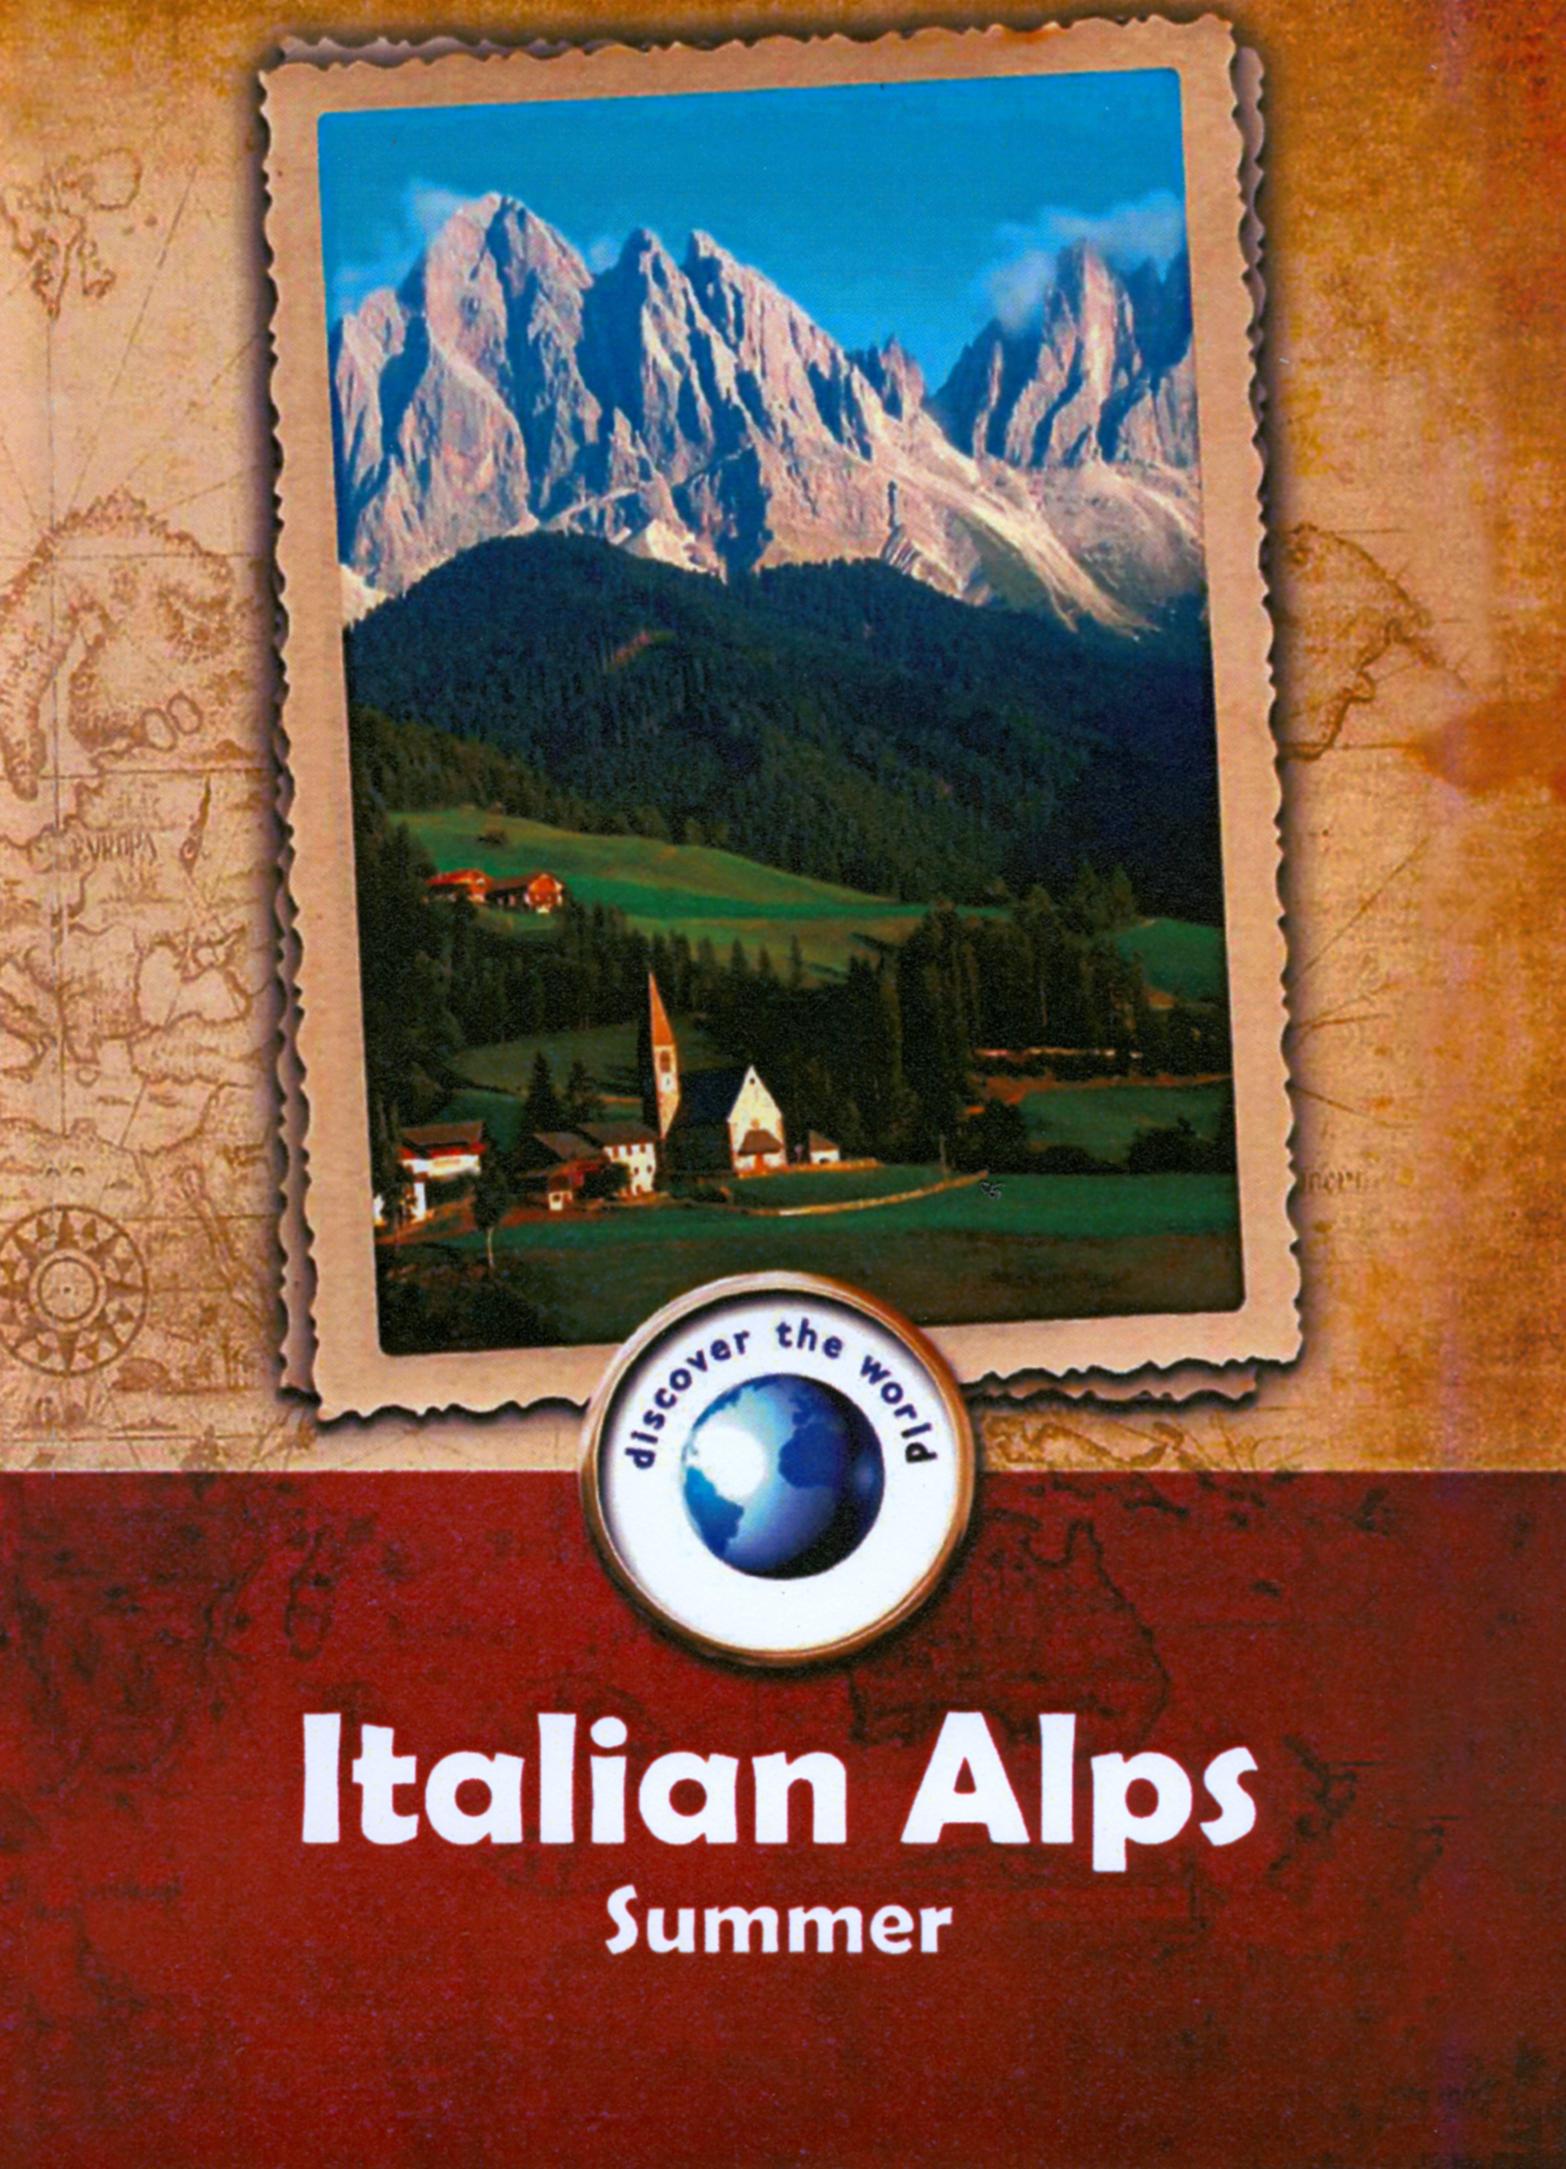 Discover the World: Italian Alps - Summer